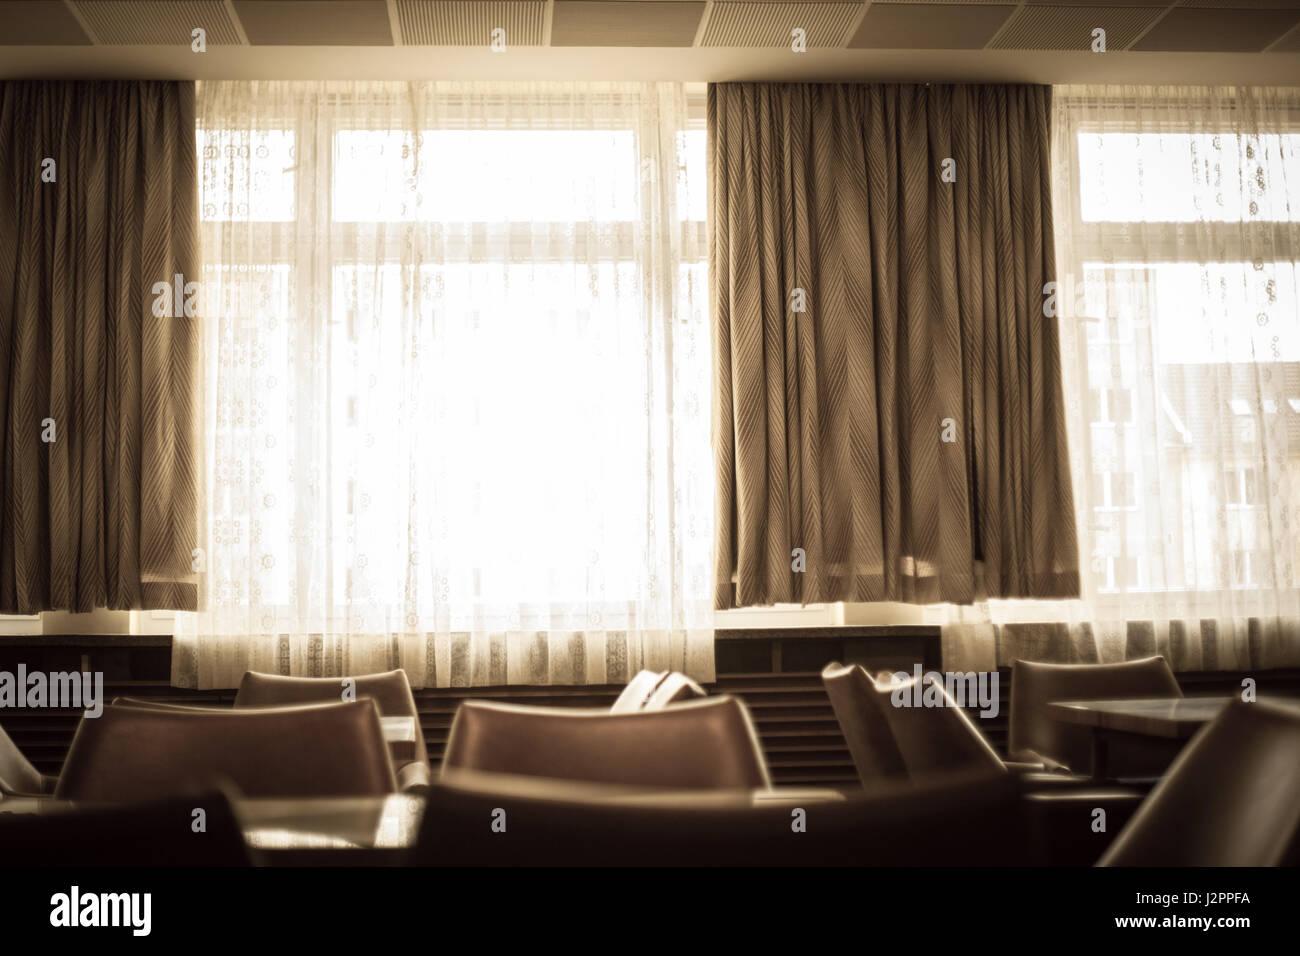 50s interior design Stock Photo: 139412878 - Alamy